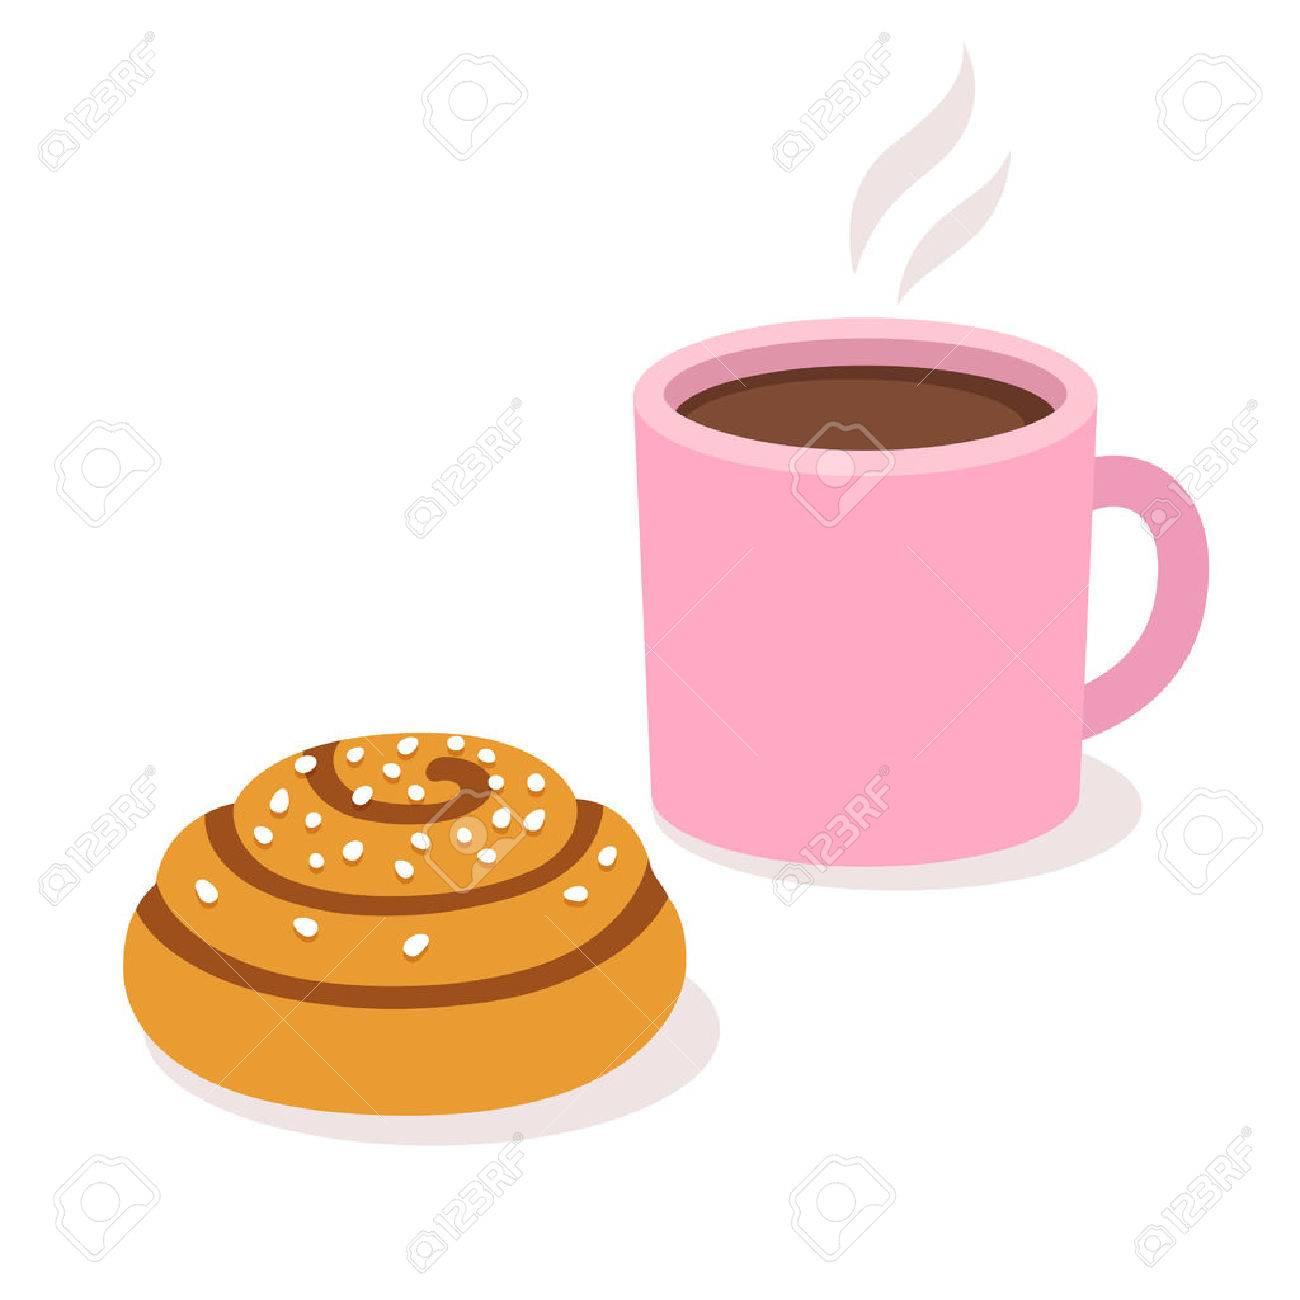 Bildresultat för clipart bun coffee